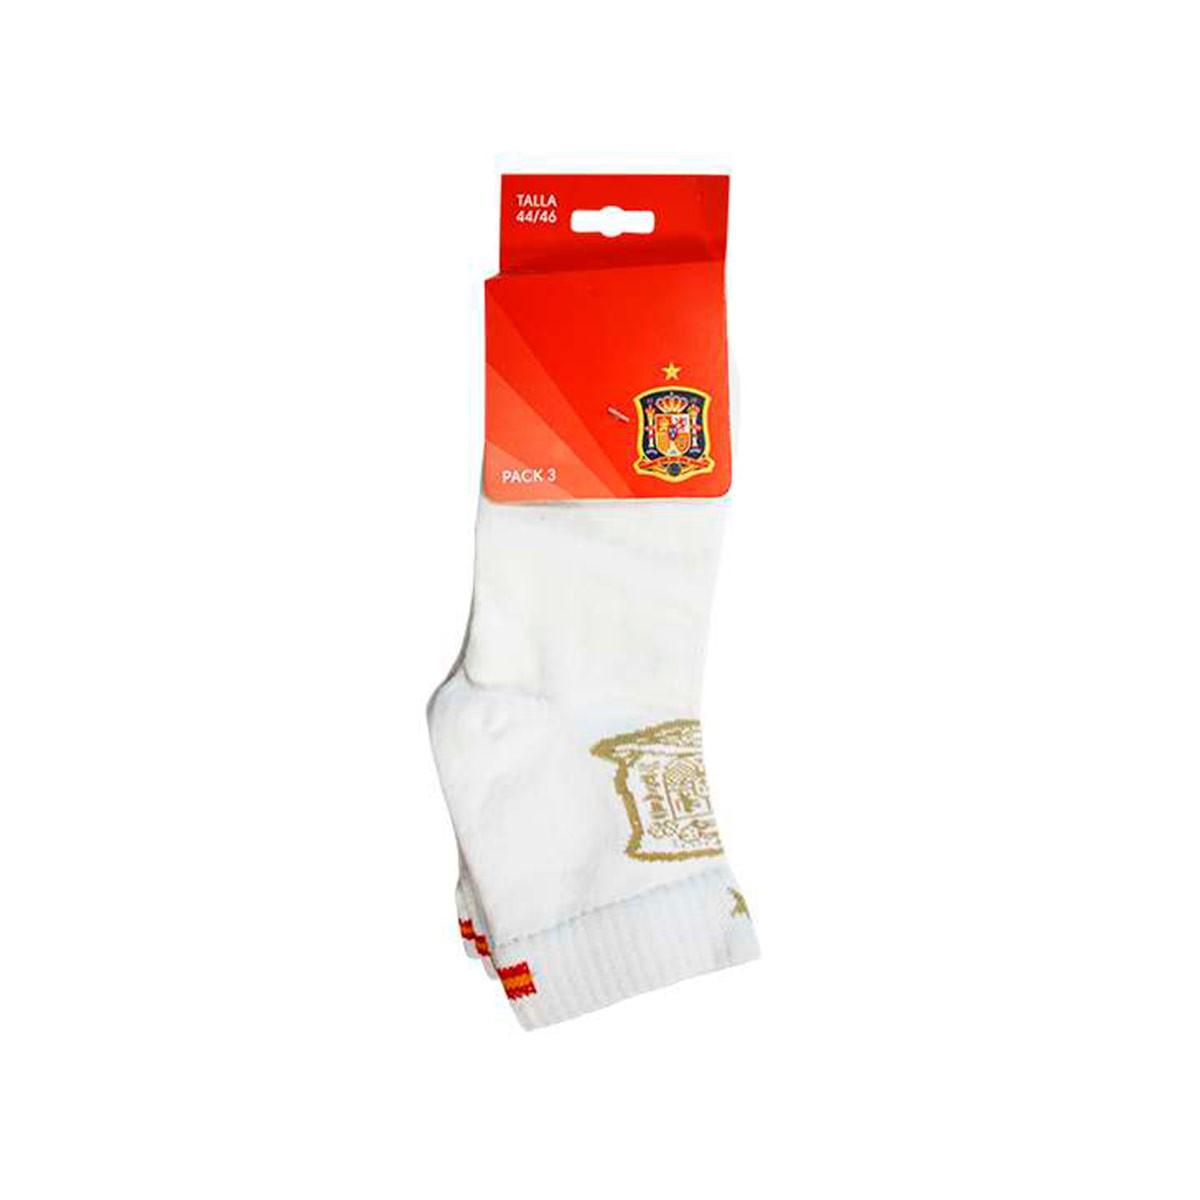 Pack Jim Sports 3 Pares de calcetines Media Caña Selección Española ... cdbe798171d